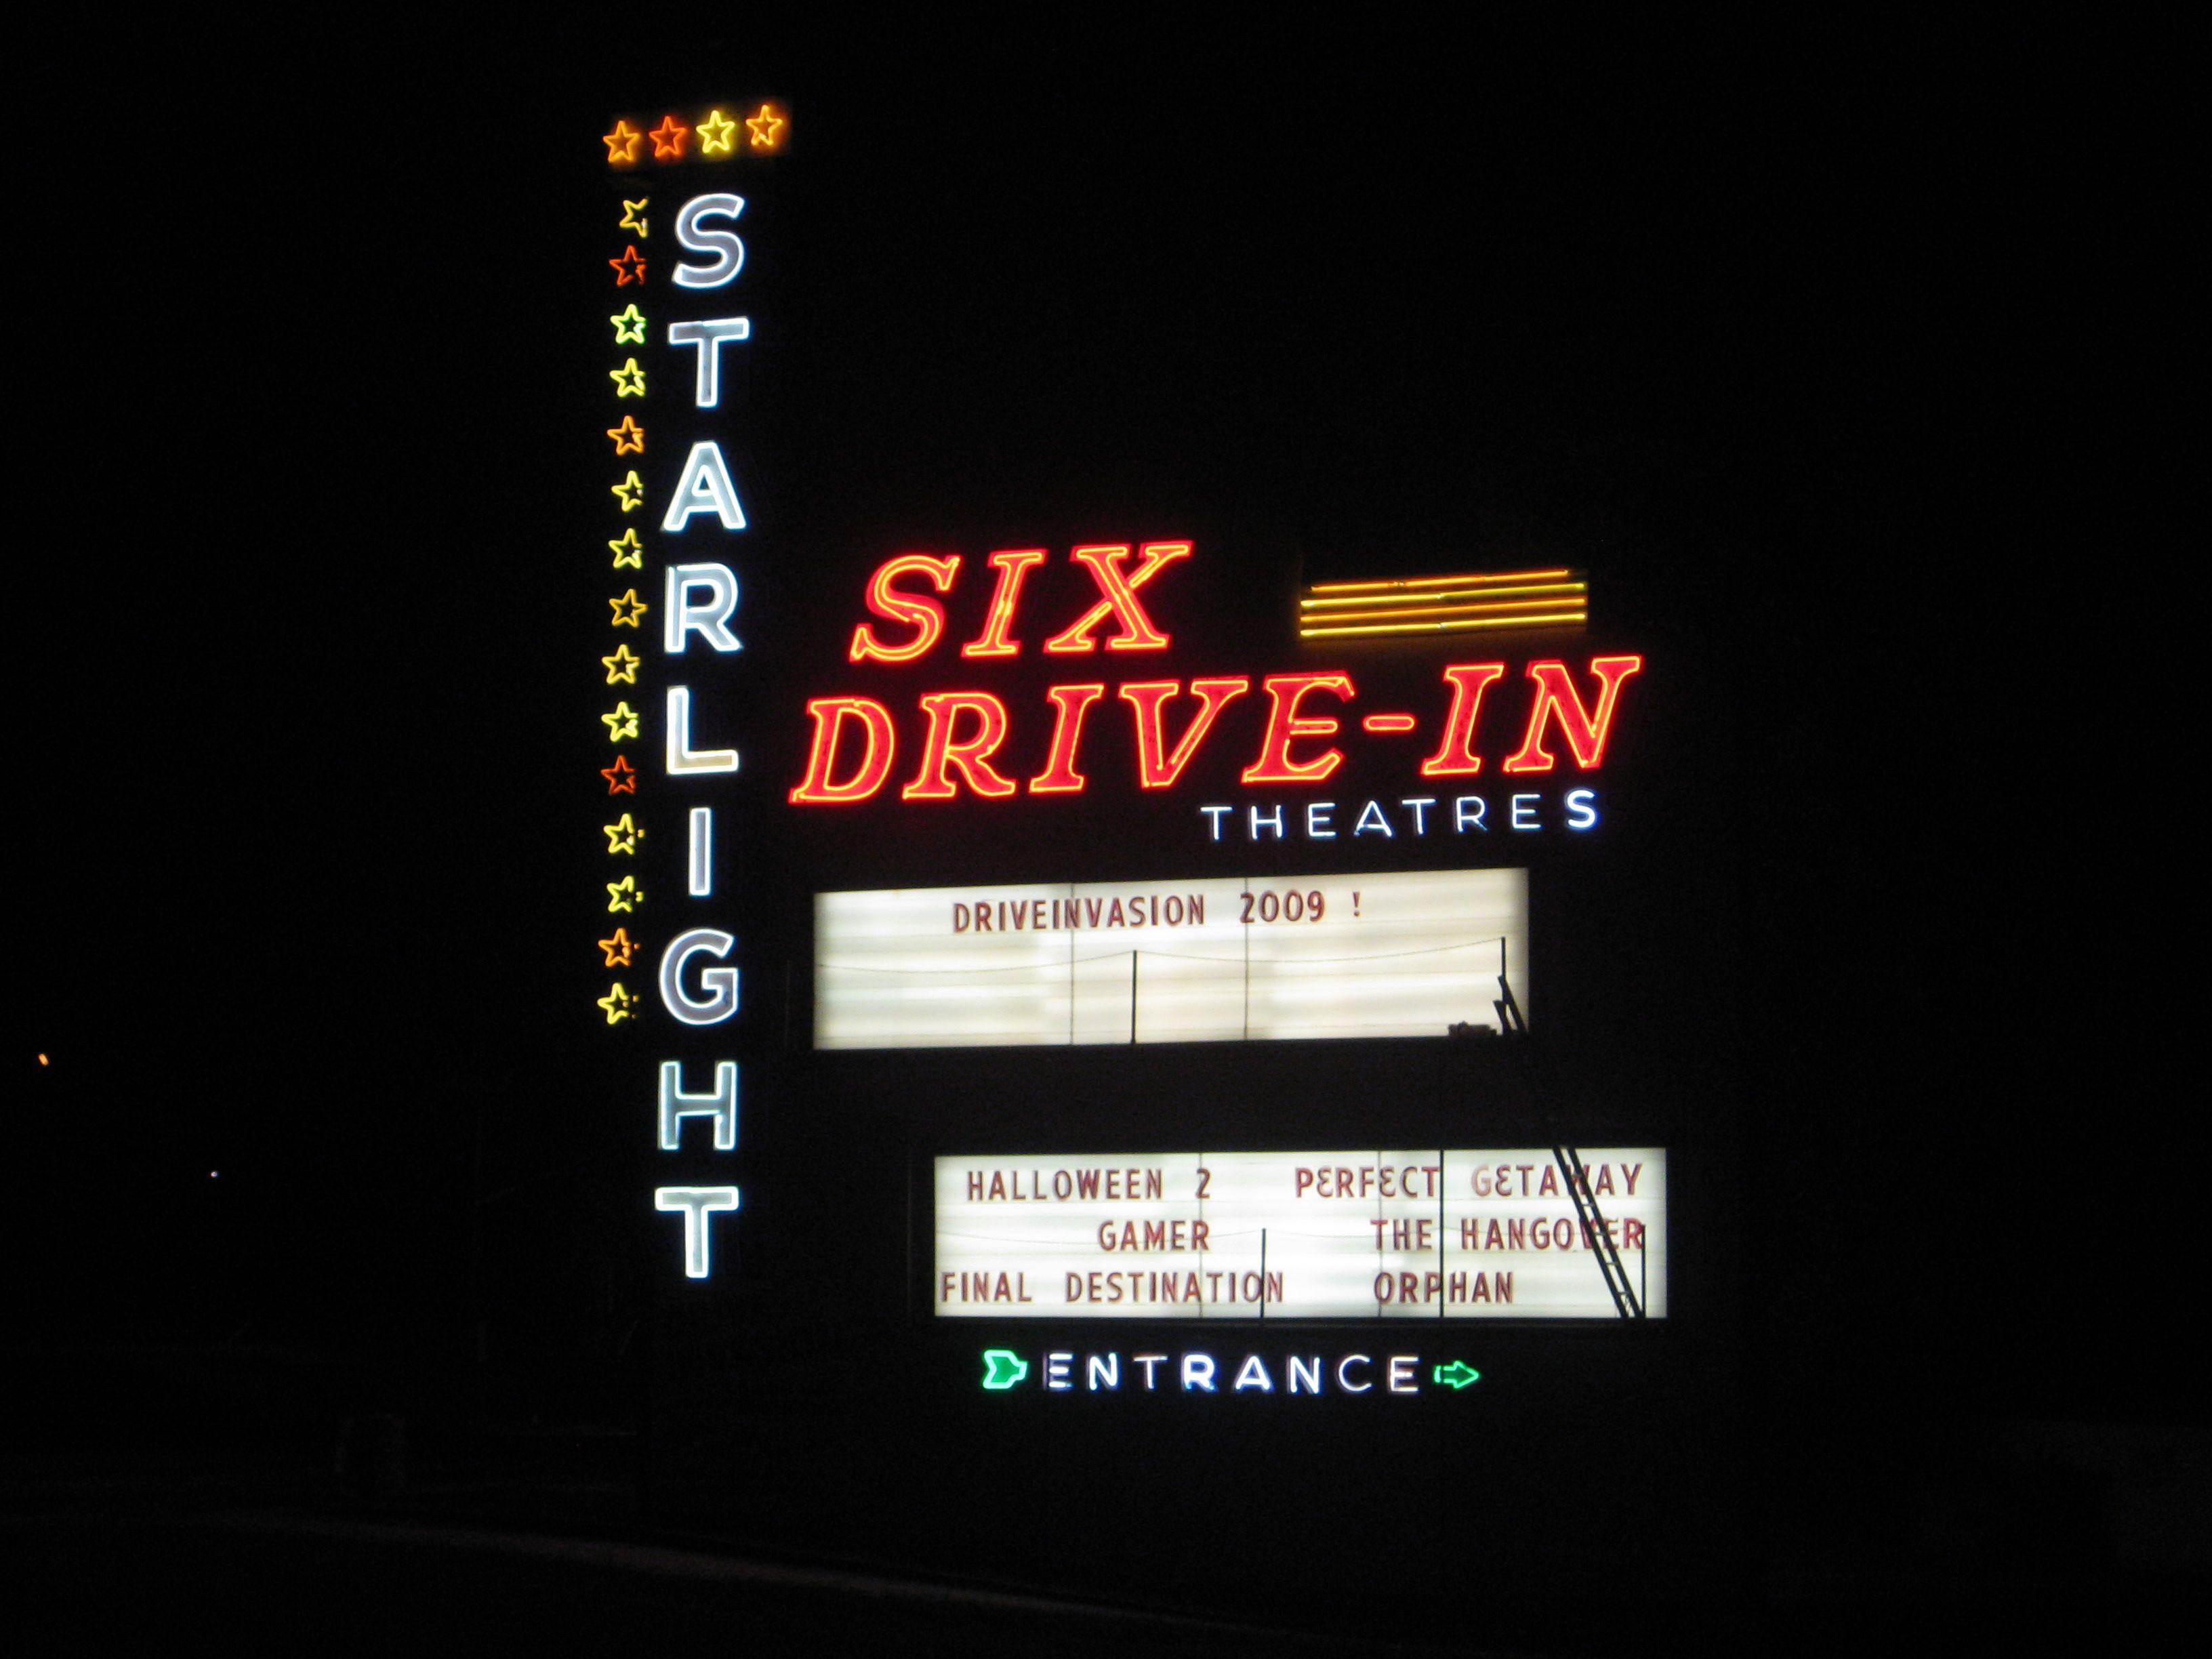 Starlight Six DriveIn, Atlanta, GA Drive in theater